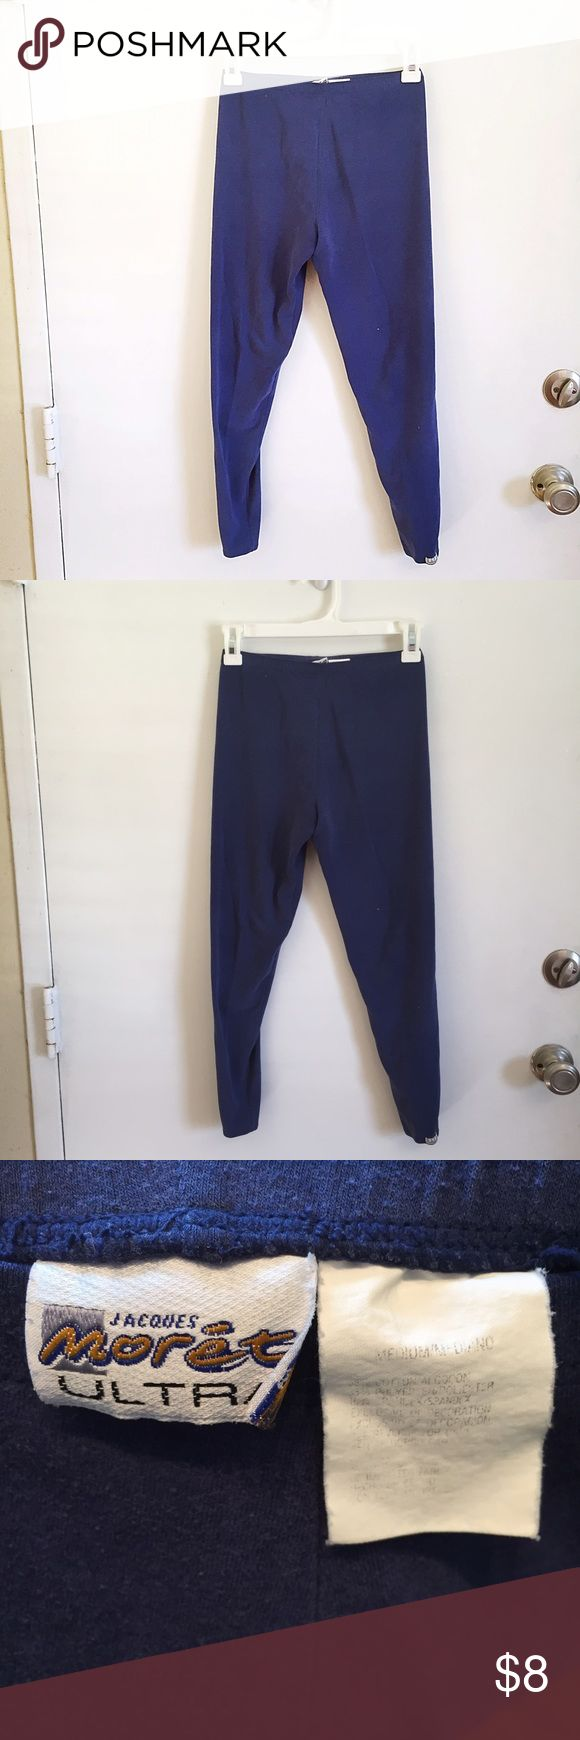 Navy Leggings Medium navy blue leggings. Very minimal wear. #navy #blue #leggings #basic #staple #layering #medium #punkydoodle  No modeling Smoke and pet free home I do discount bundles Jaques Moret Pants Leggings